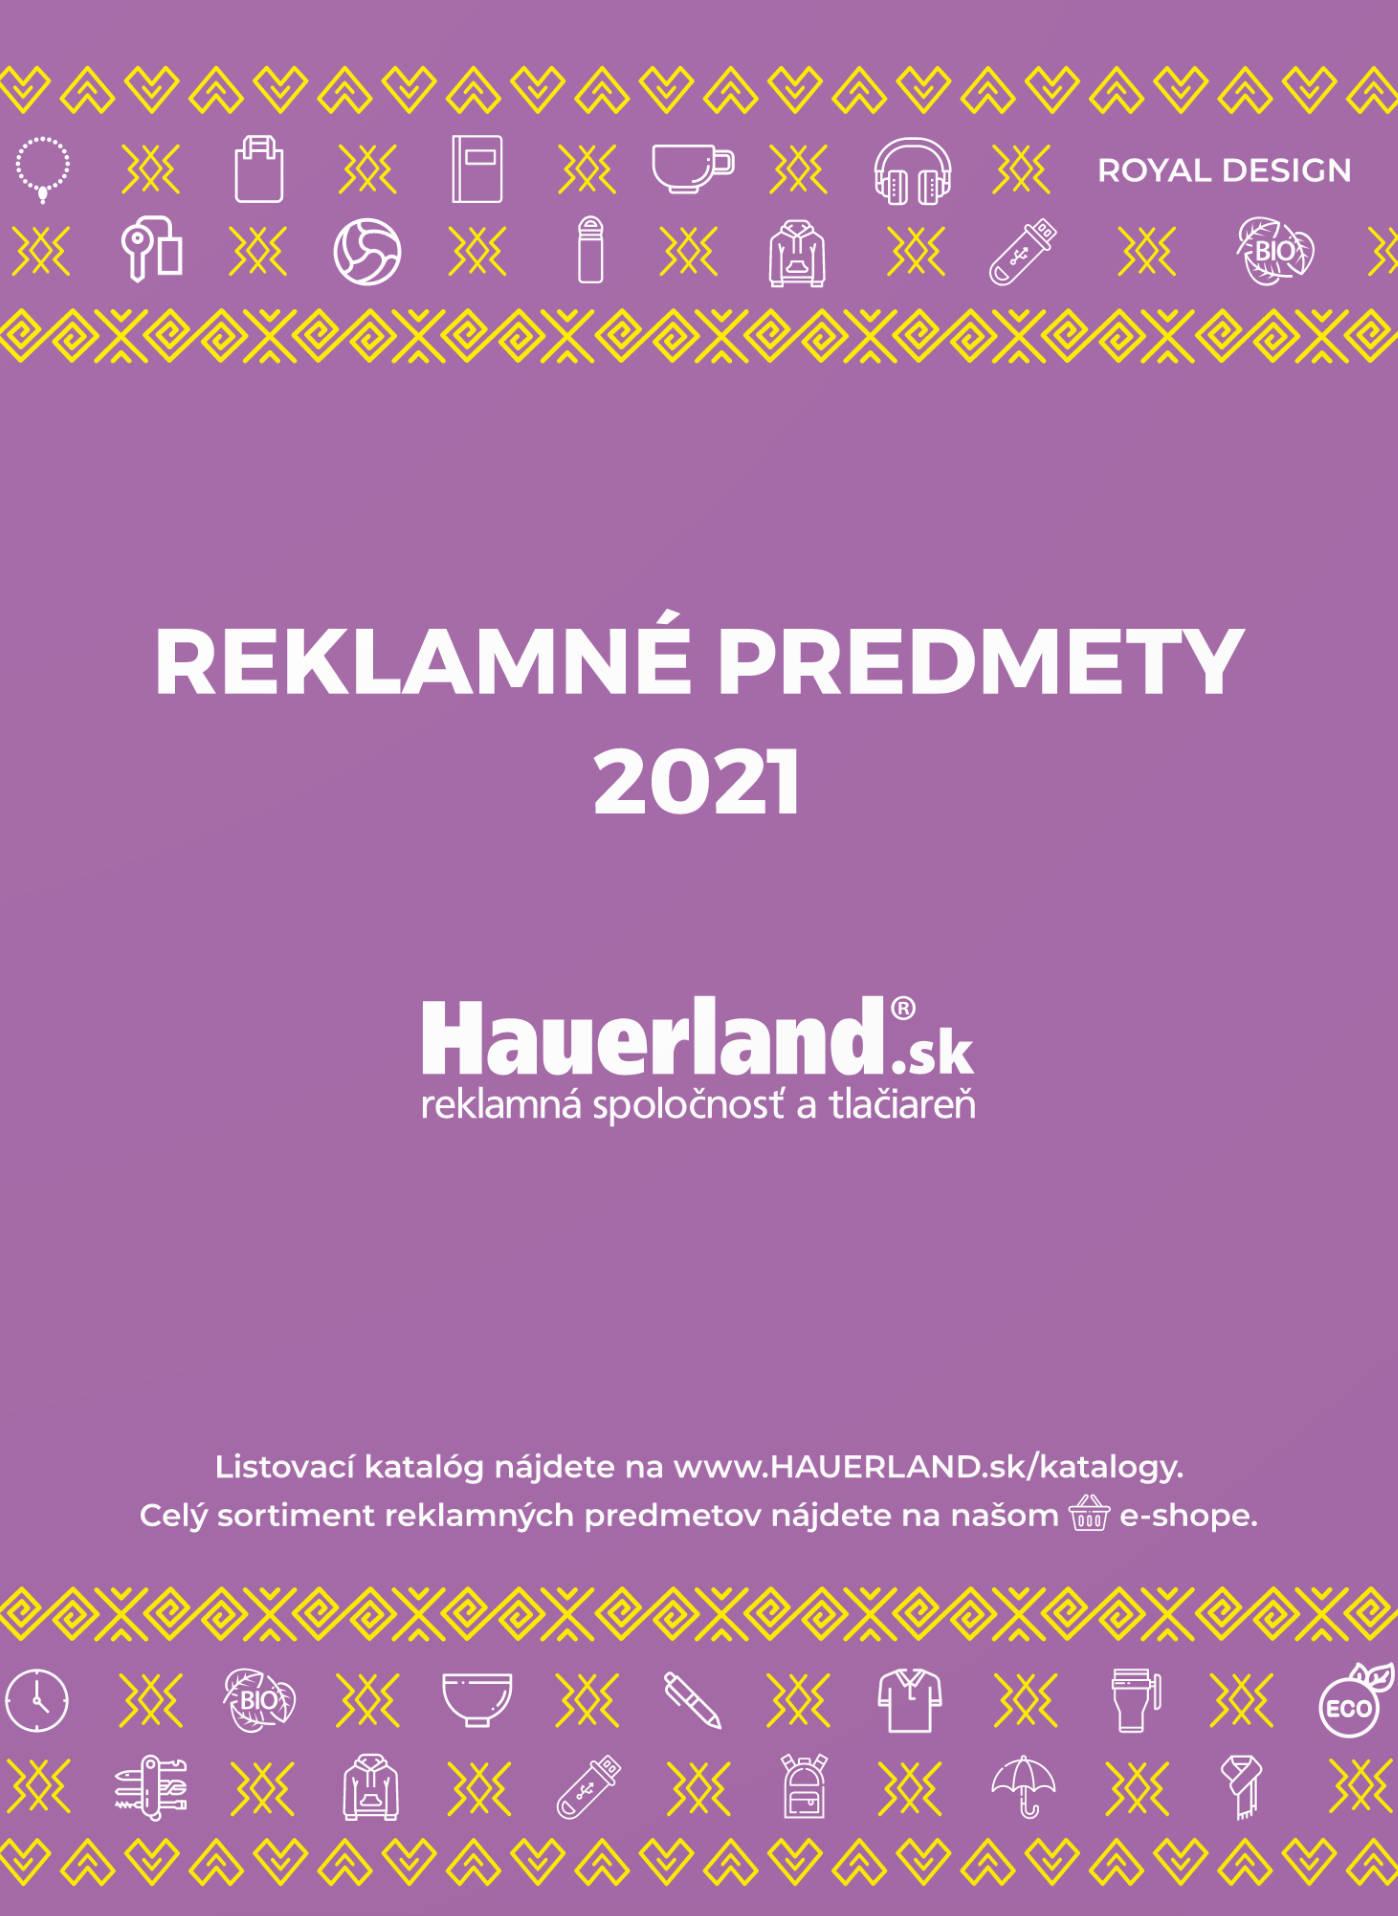 Royal Design 2021